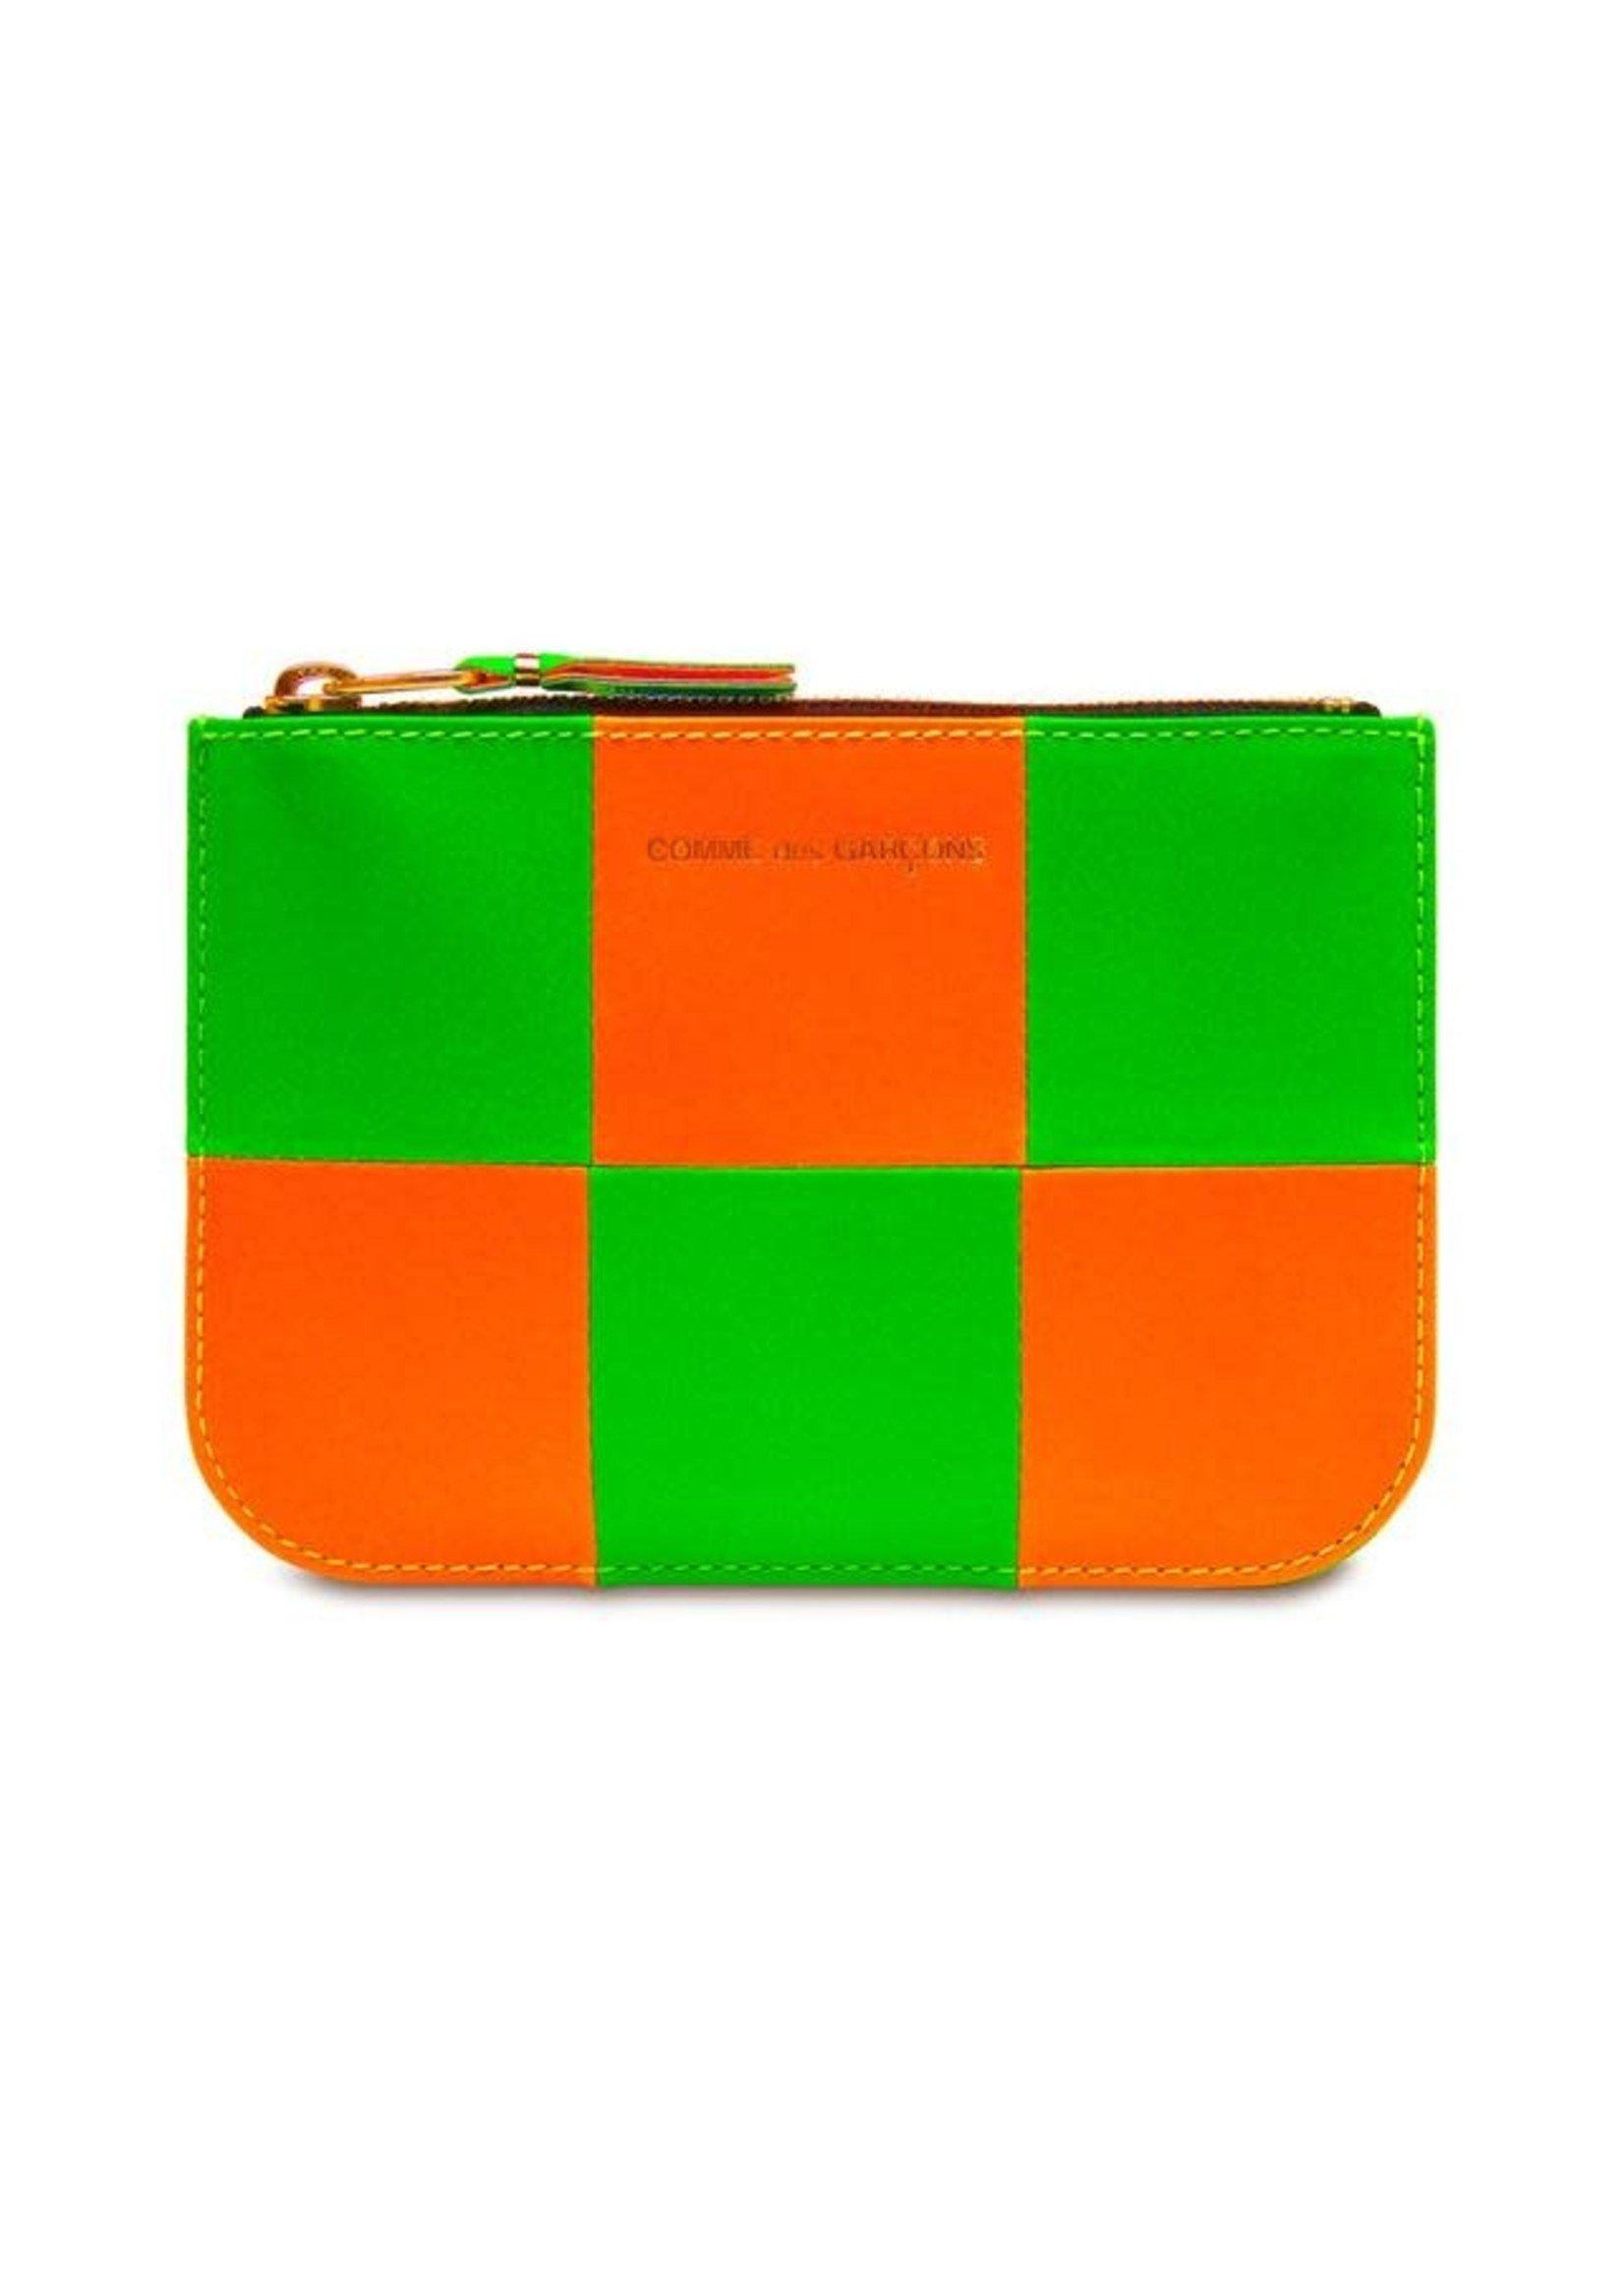 COMME des GARÇONS WALLET Small neon Checkerboard Zip Pouch